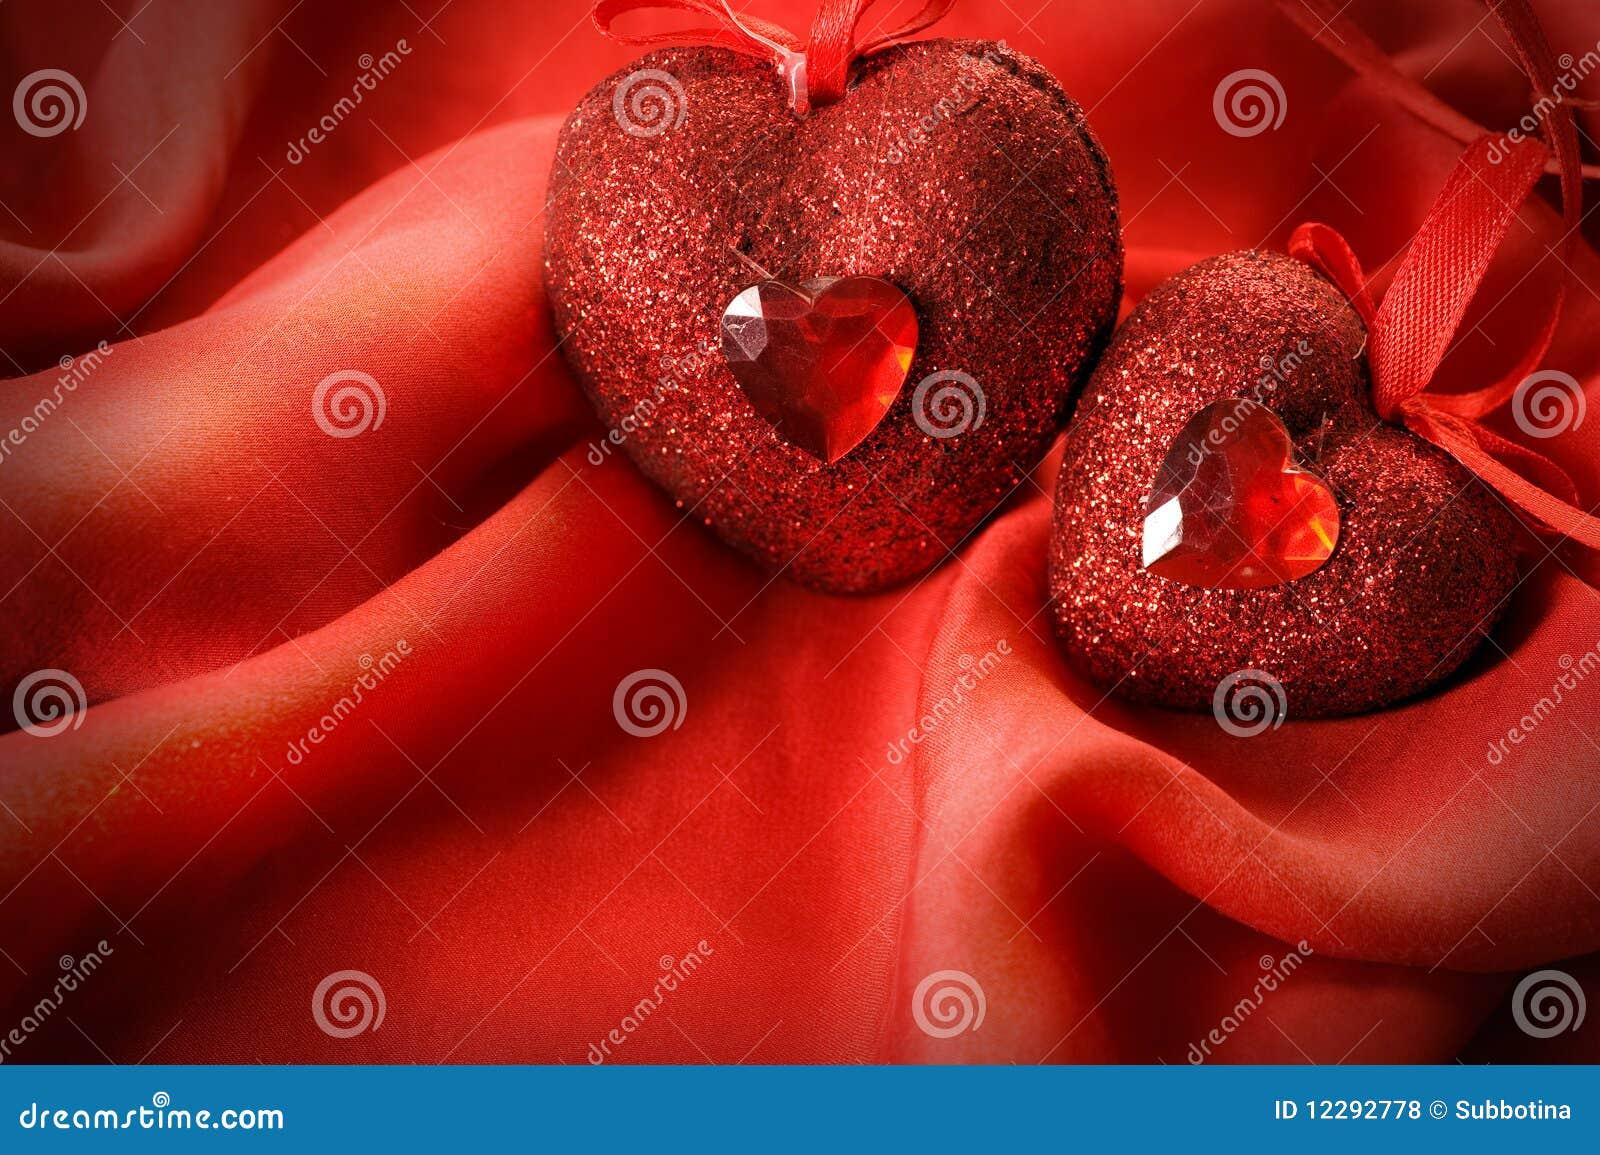 valentine hearts royalty free stock photos image 12292778